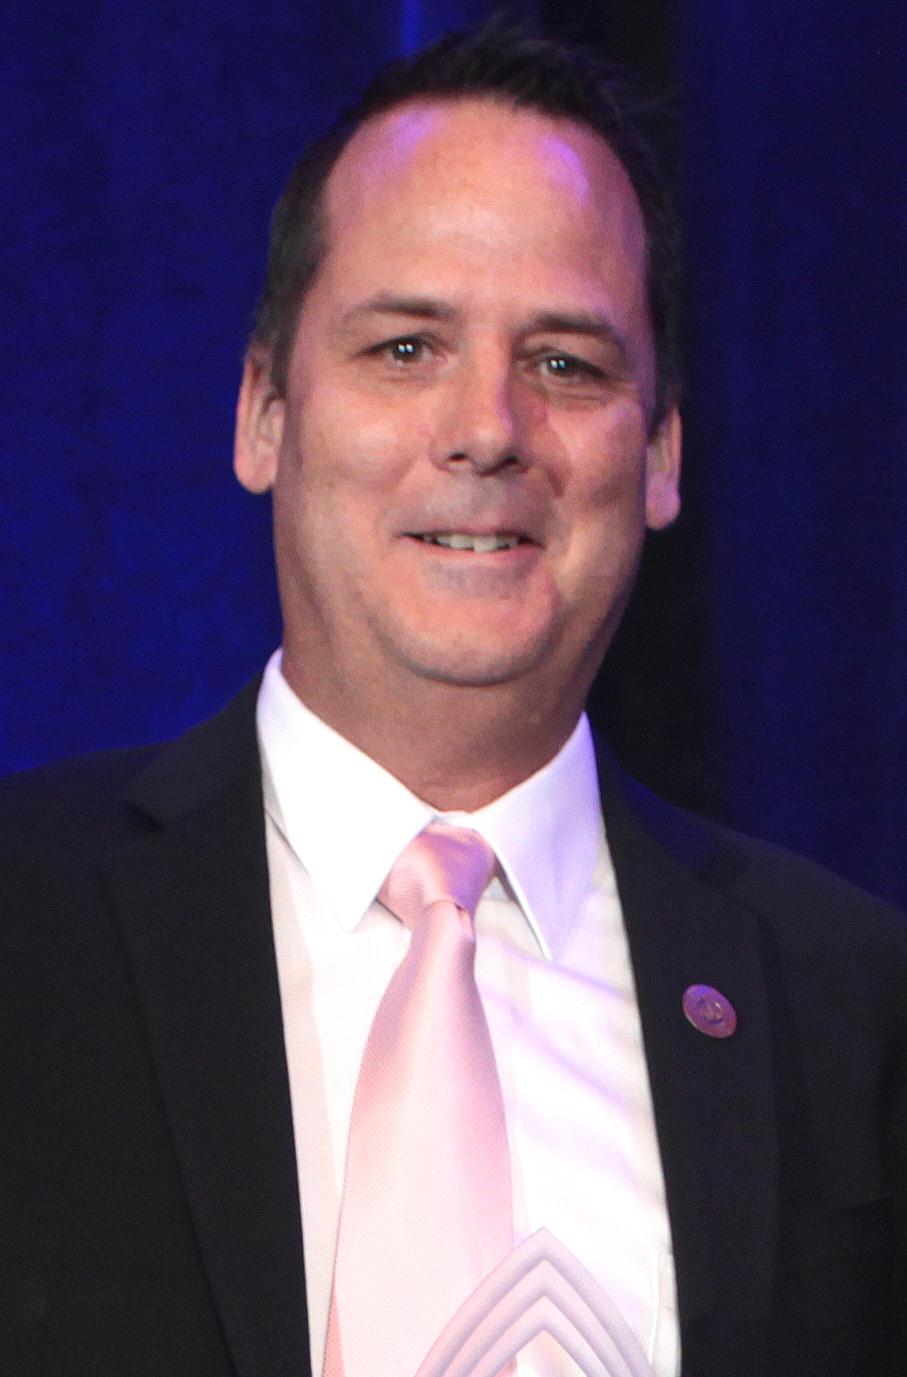 Arizona State Representatives >> Jeff Weninger - Wikipedia